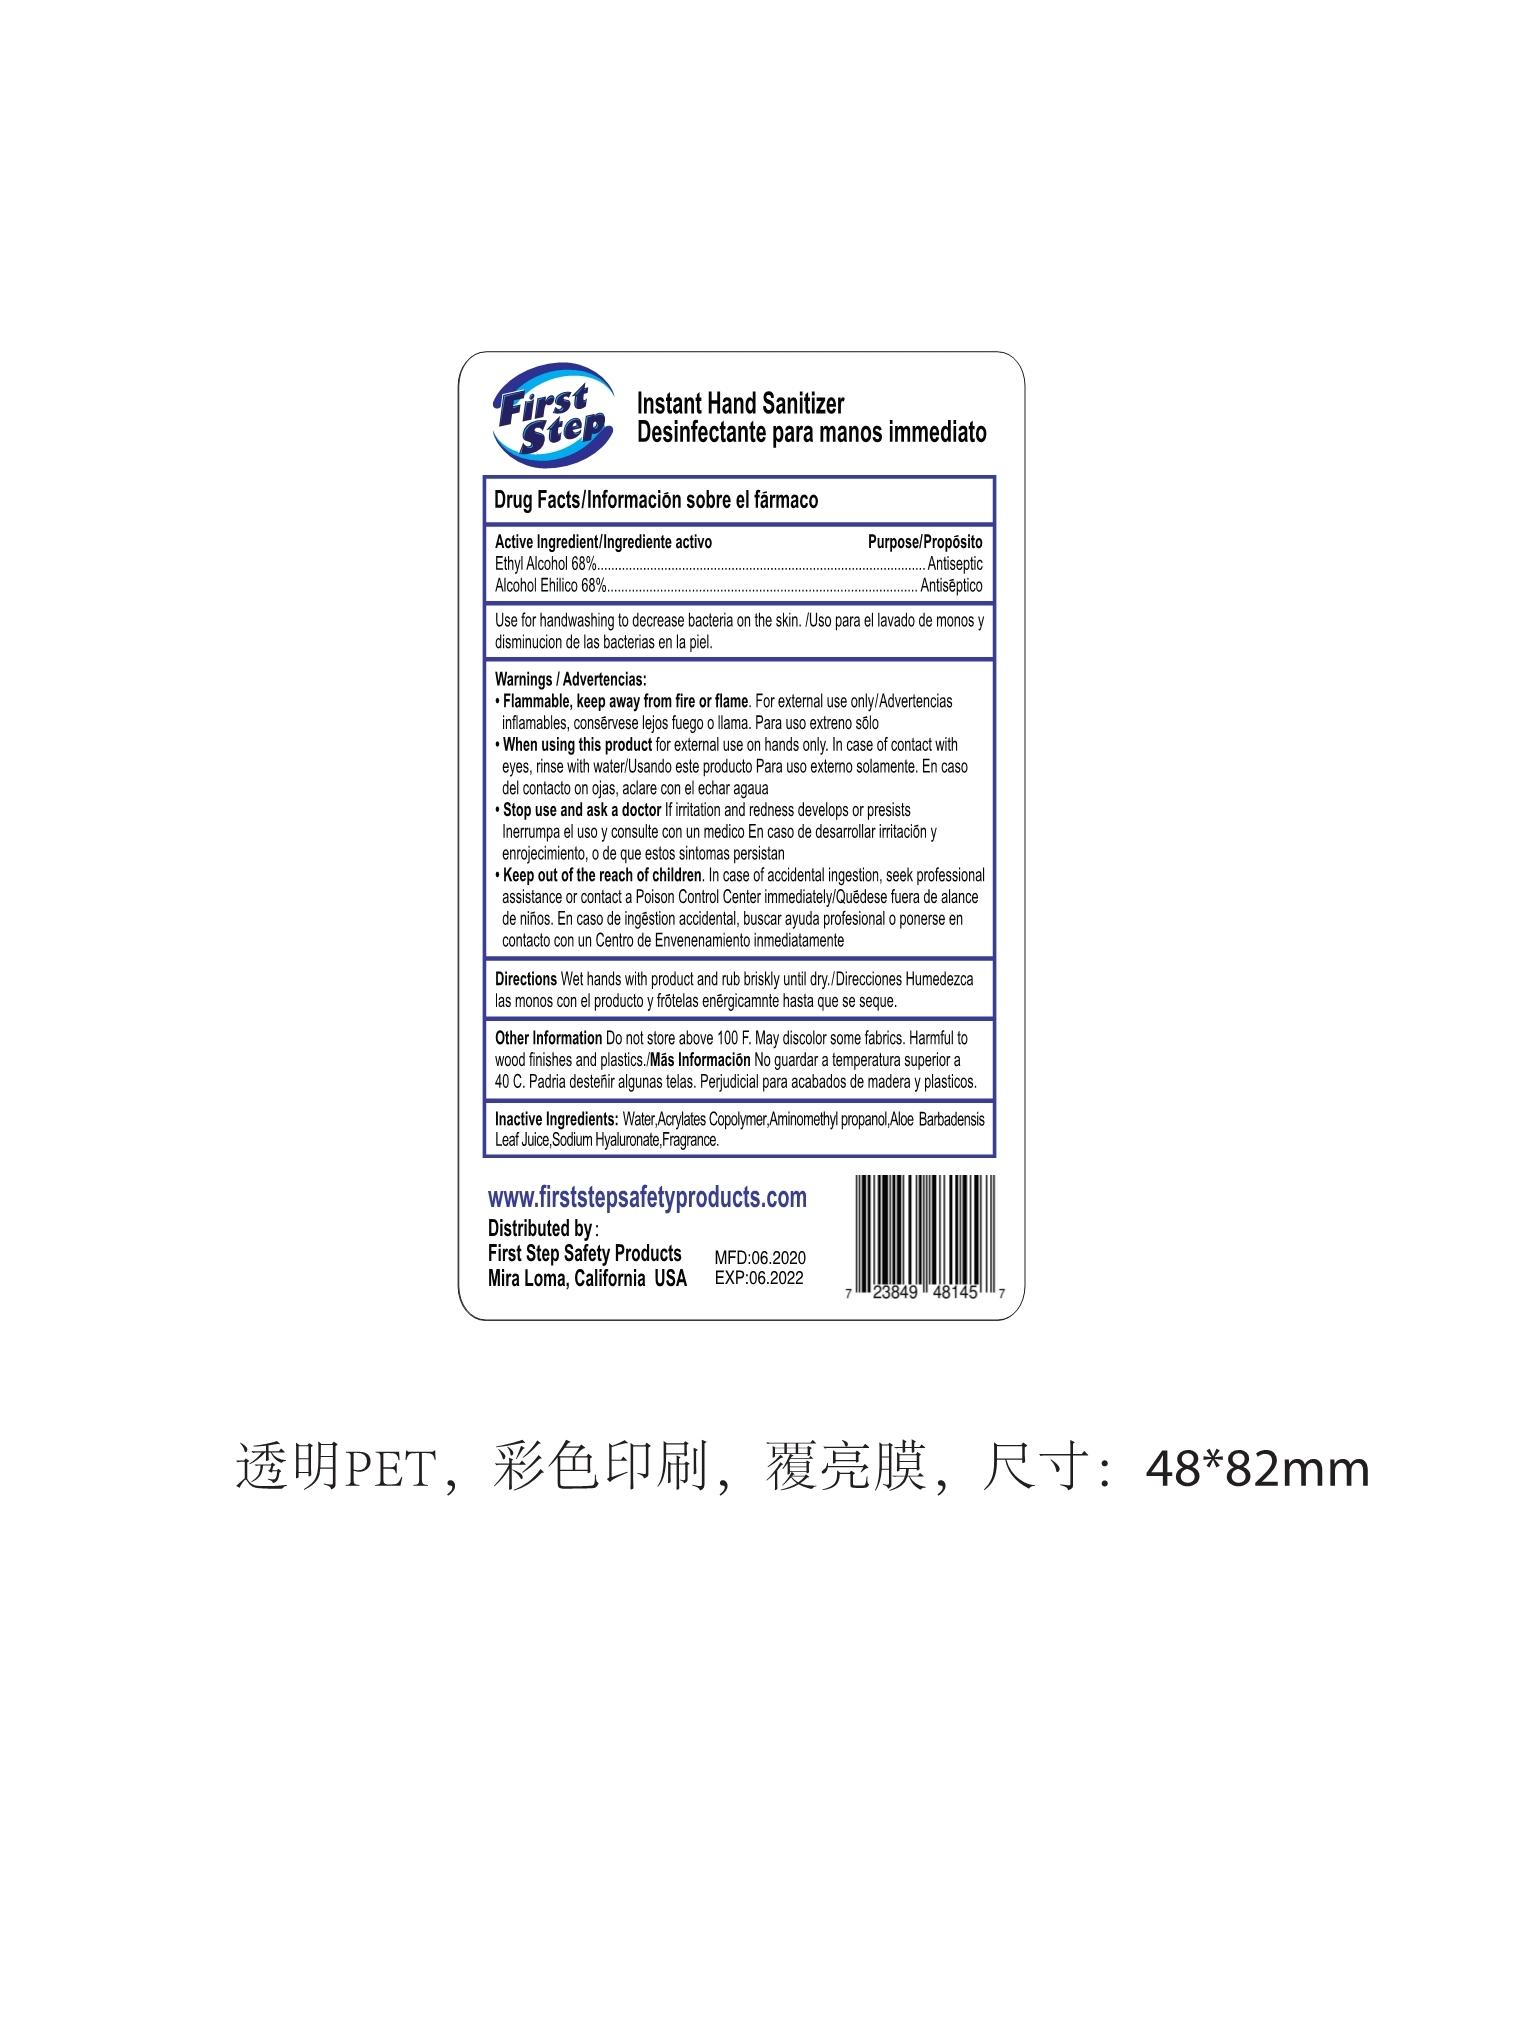 236mL label